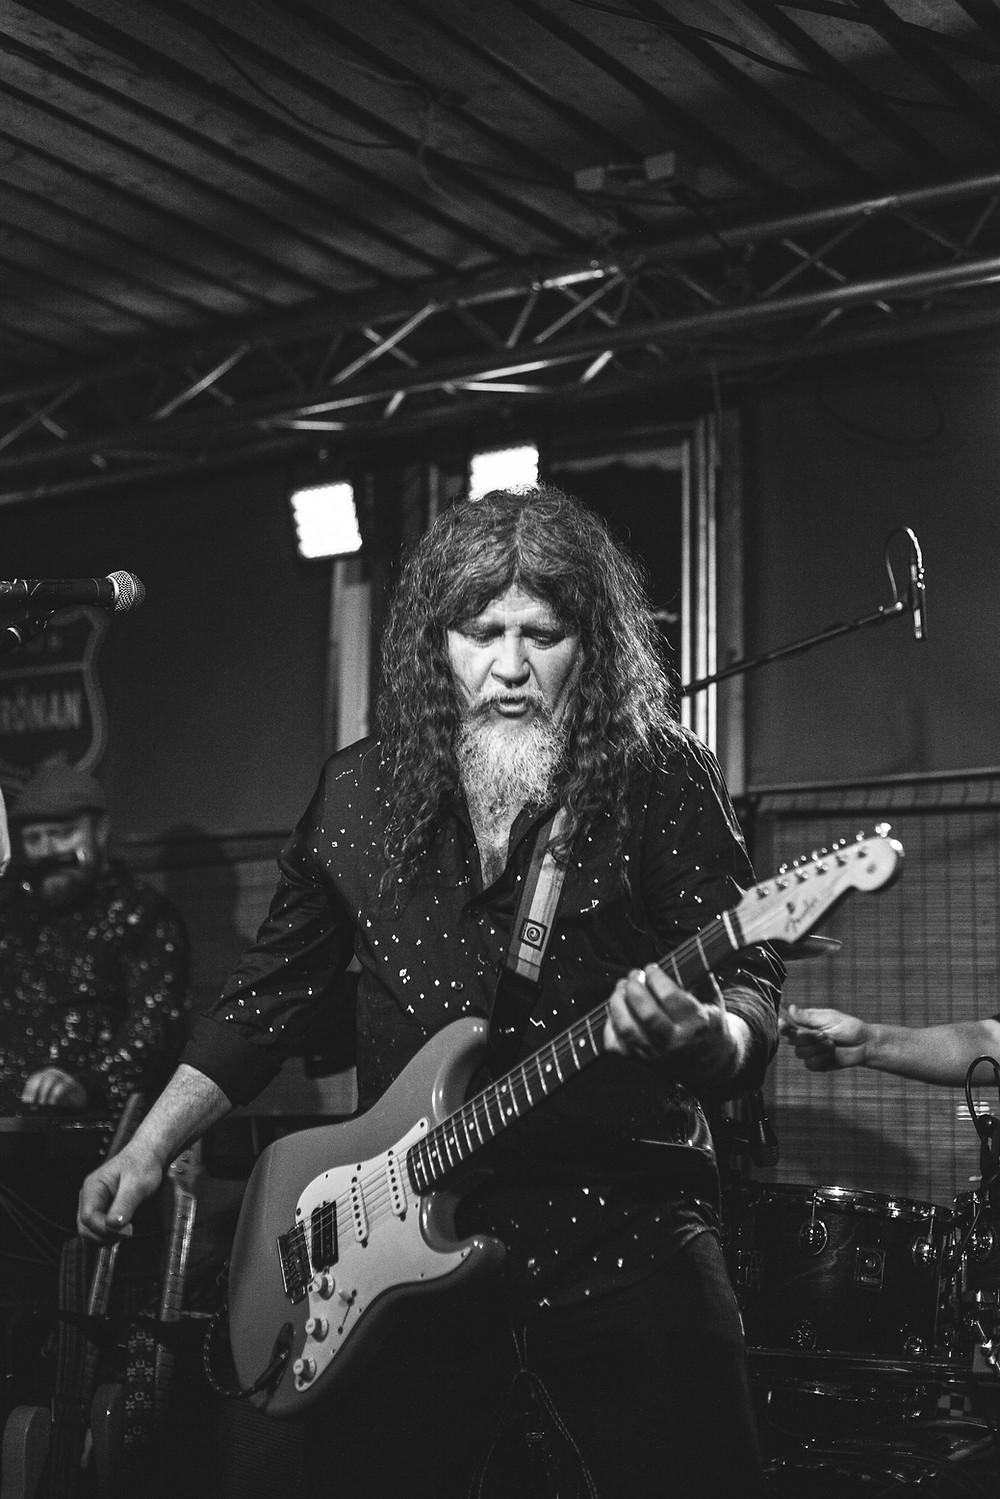 Bryn Jones from Drink Floyd live at Pub Grönan, Hanko